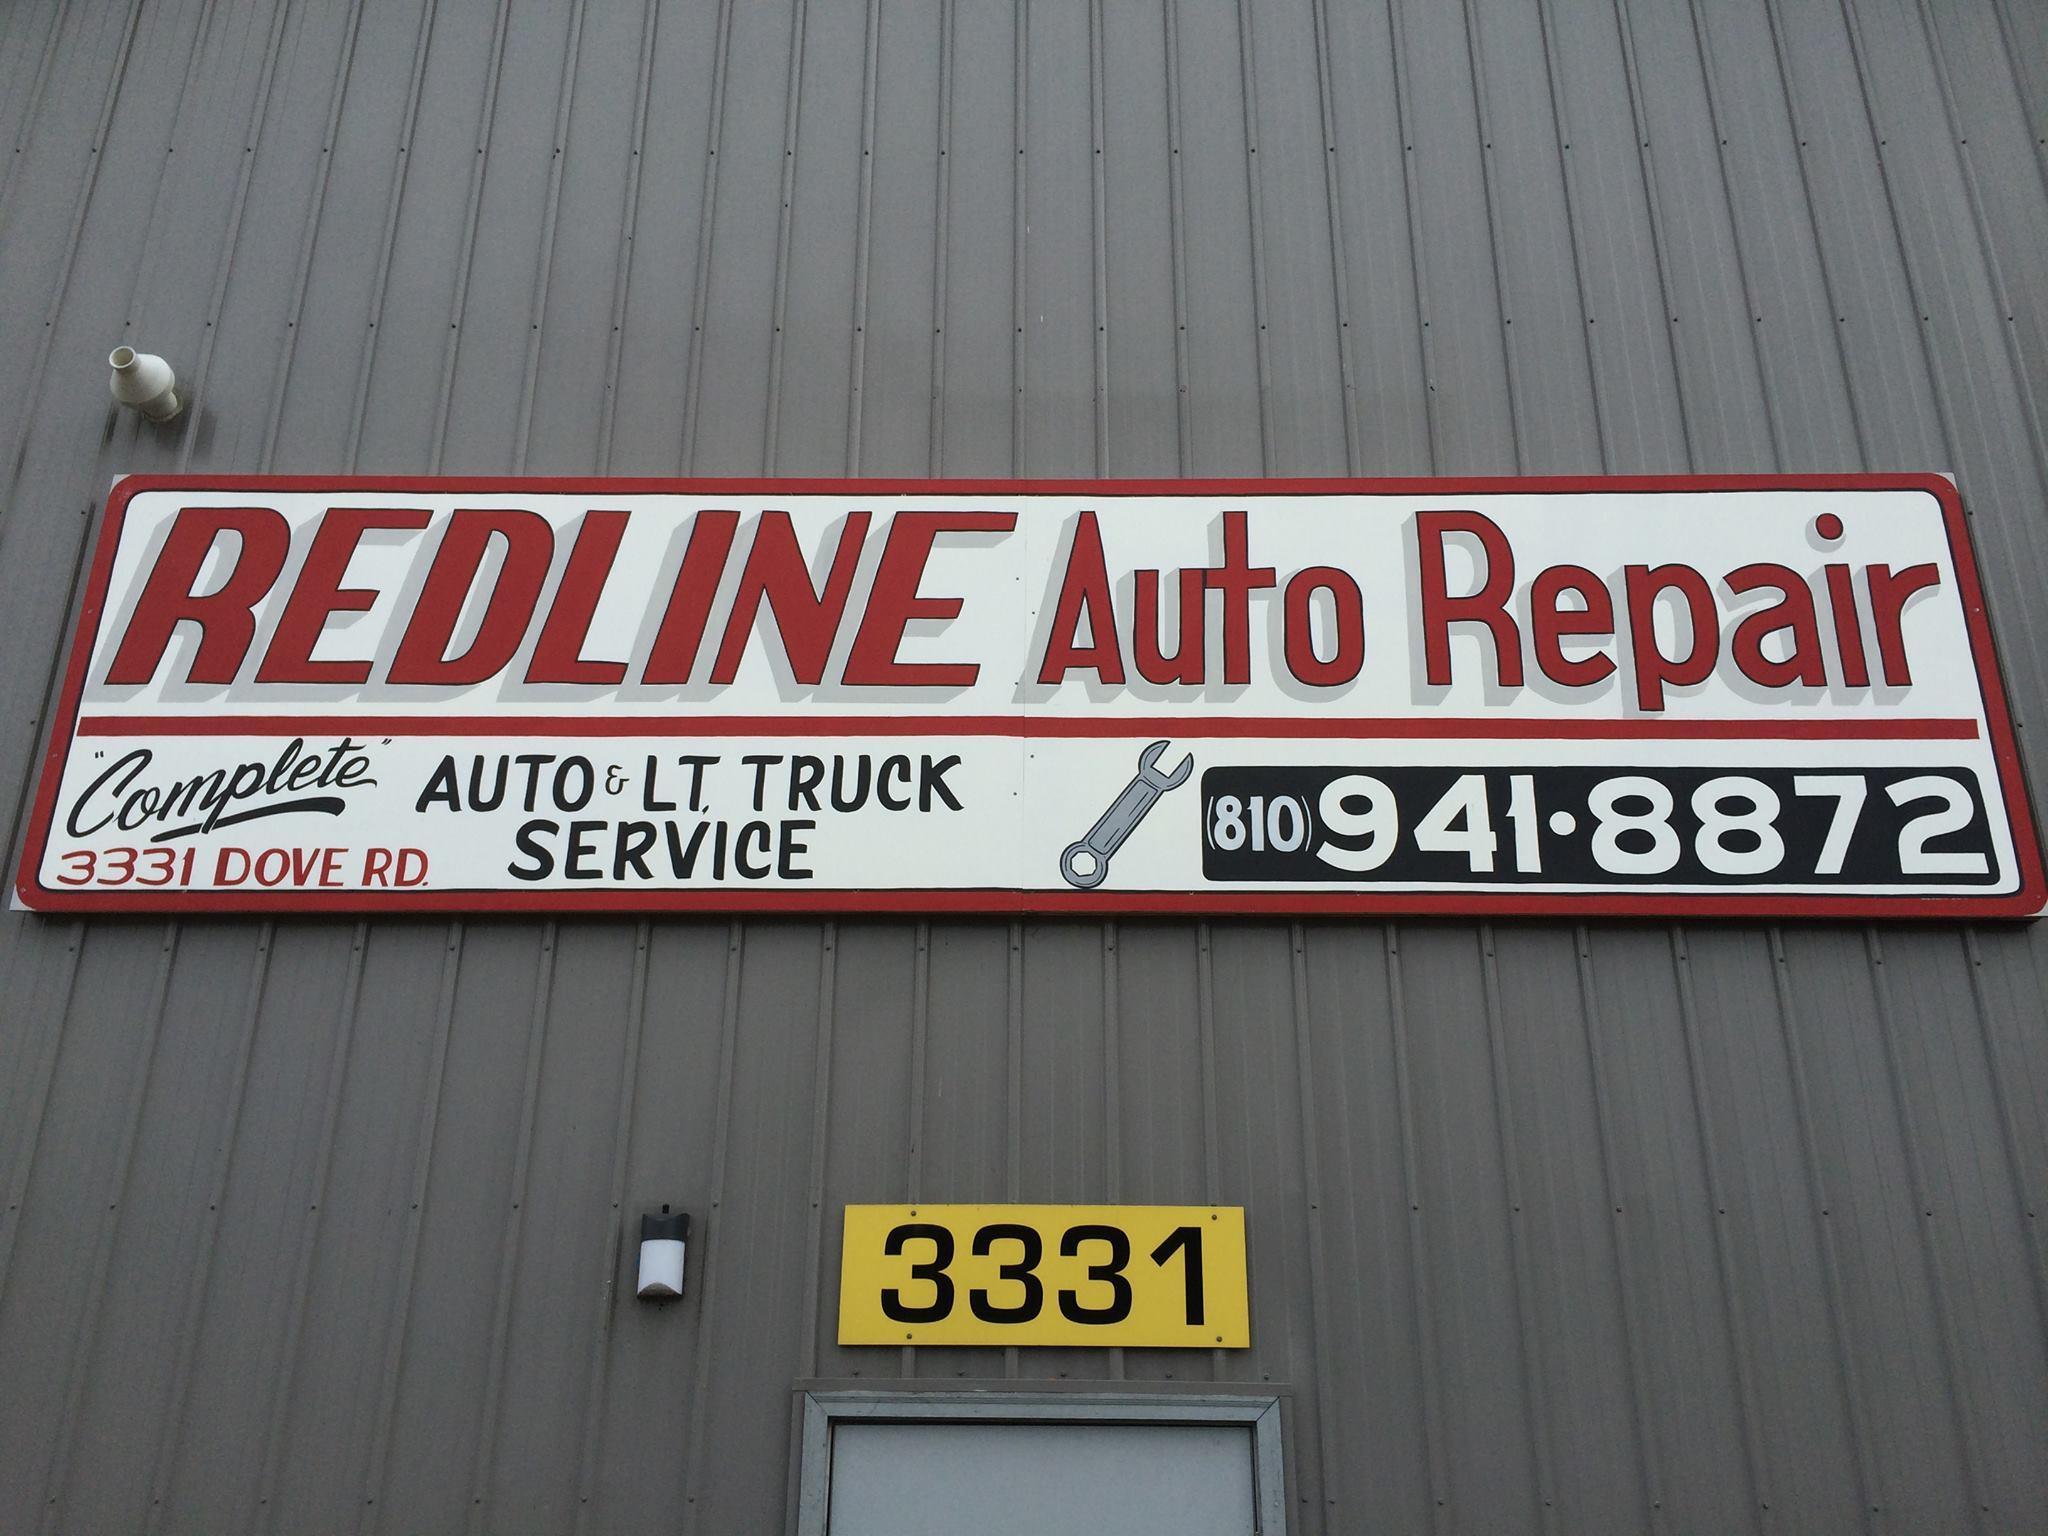 Redline Automotive Repair Port Huron Michigan Mi